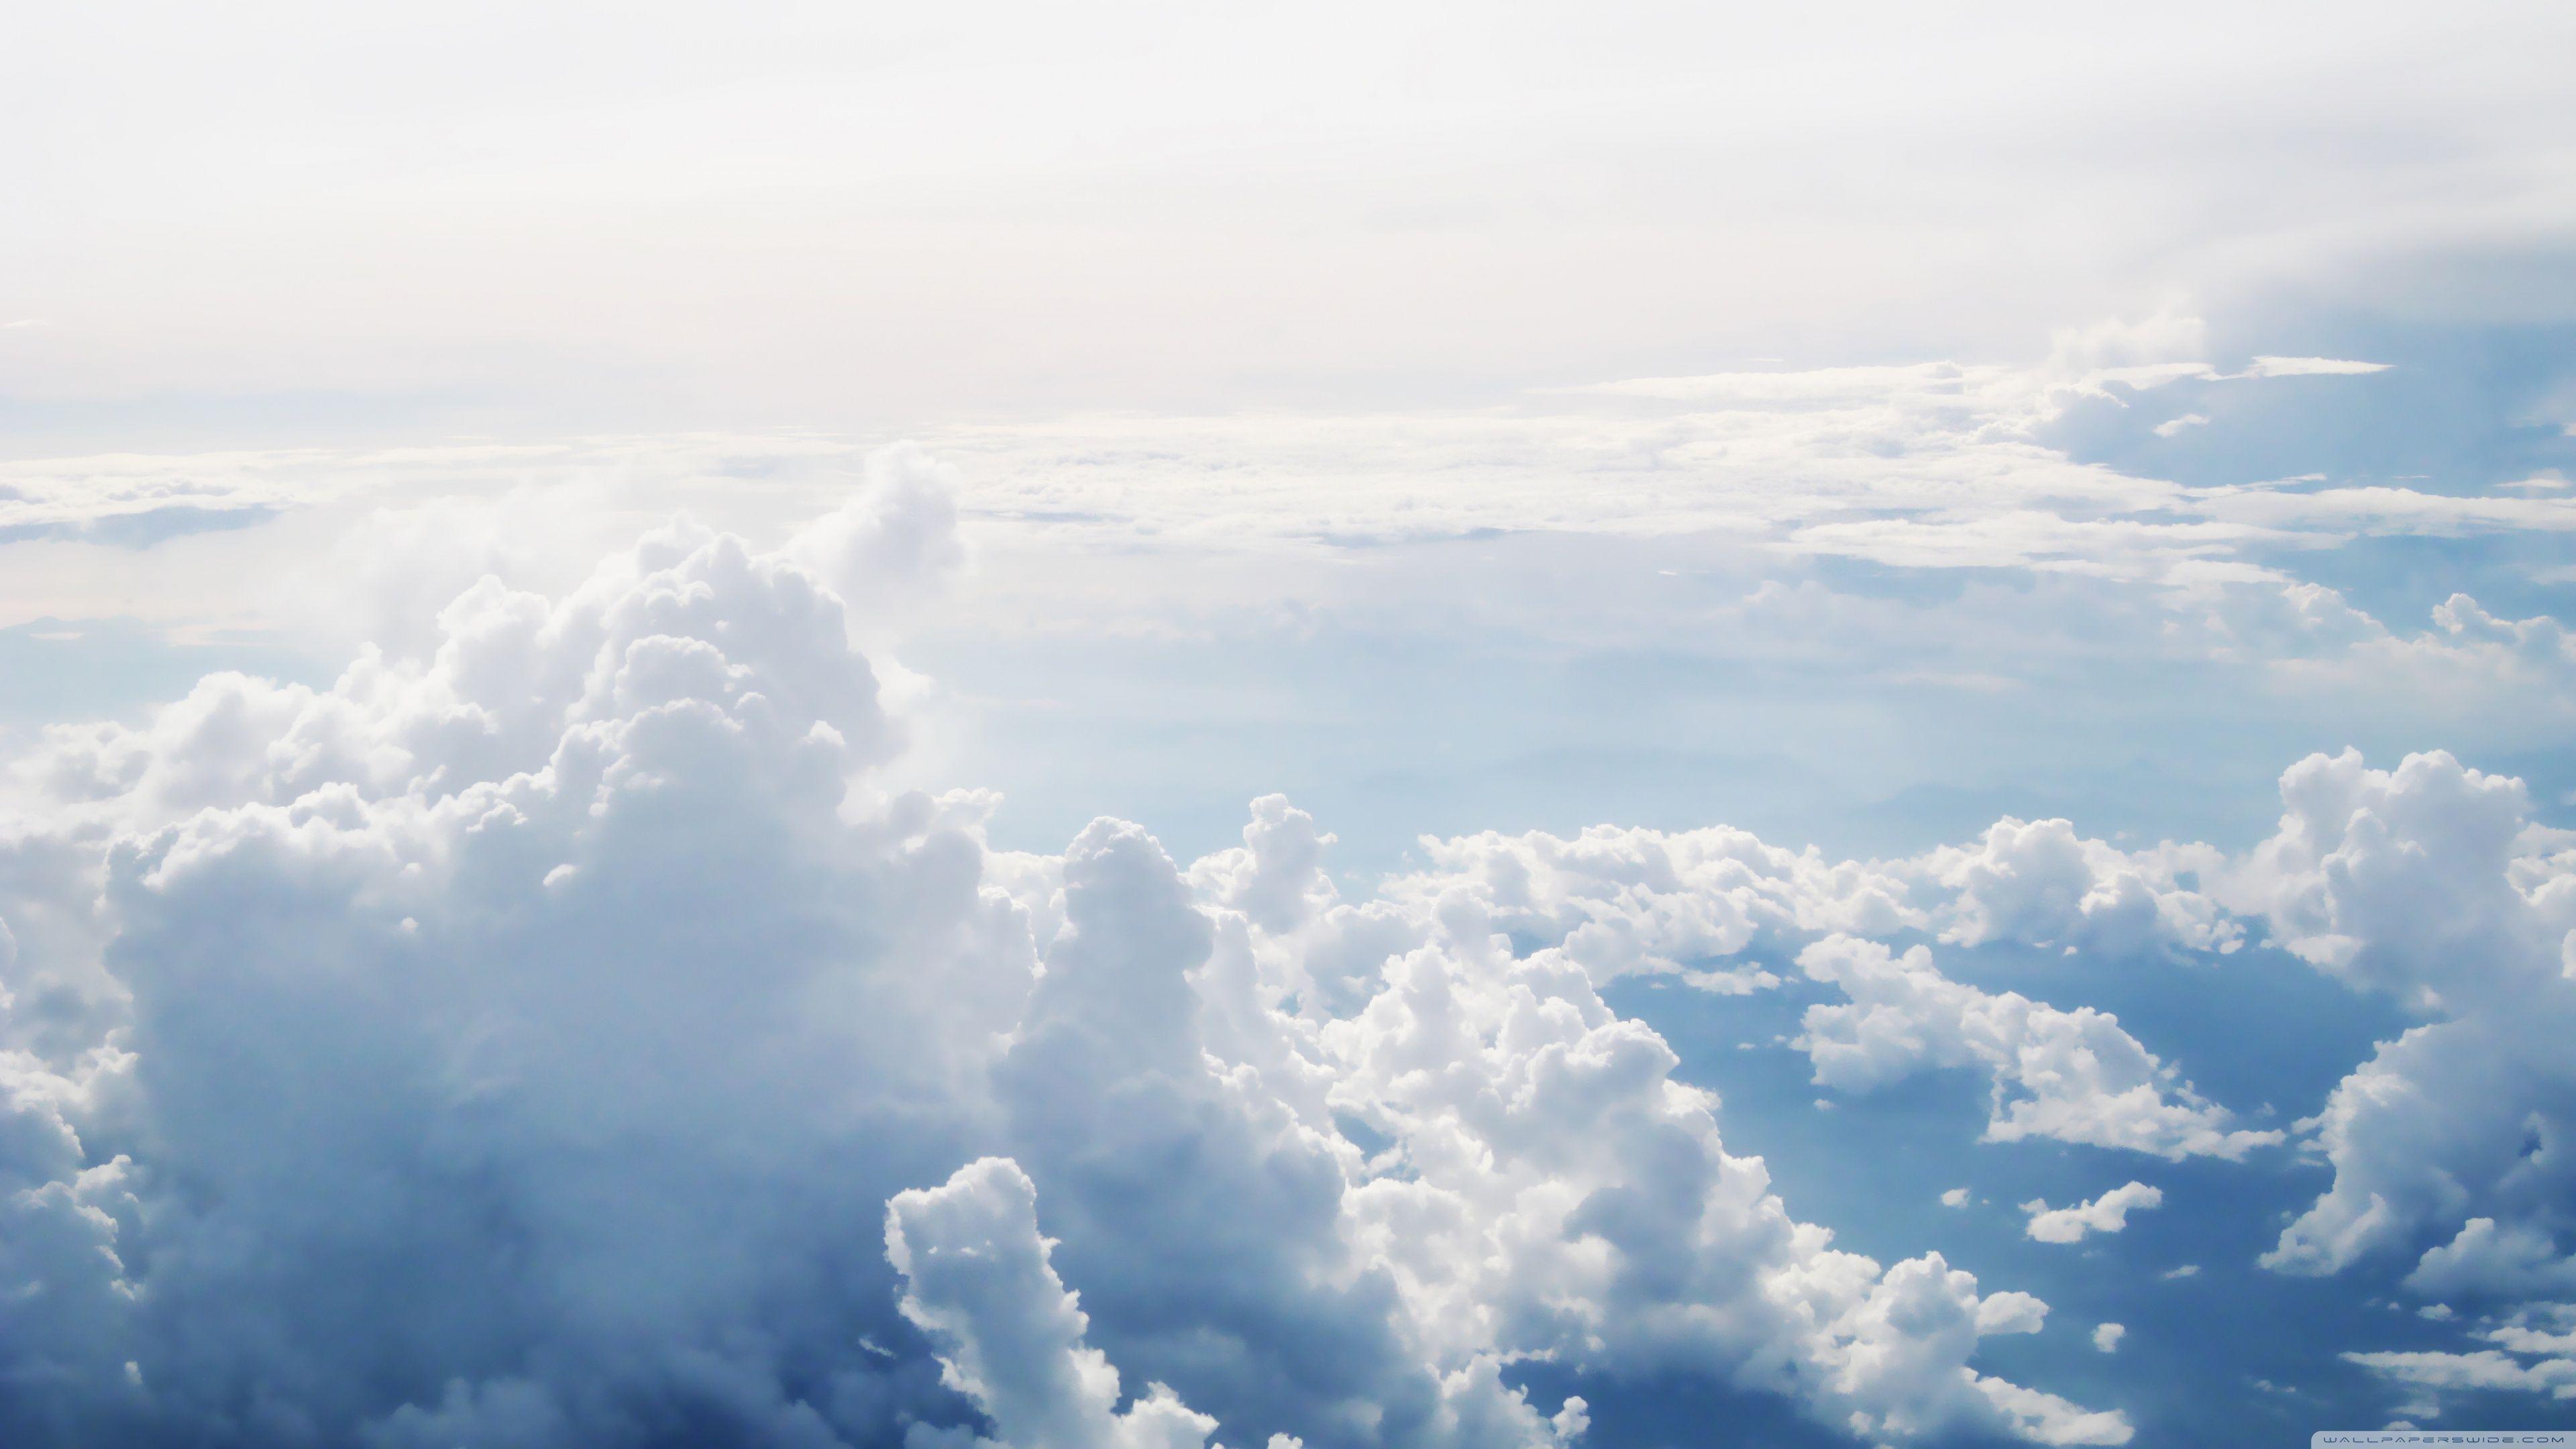 Ultra Hd Cloud Wallpapers Top Free Ultra Hd Cloud